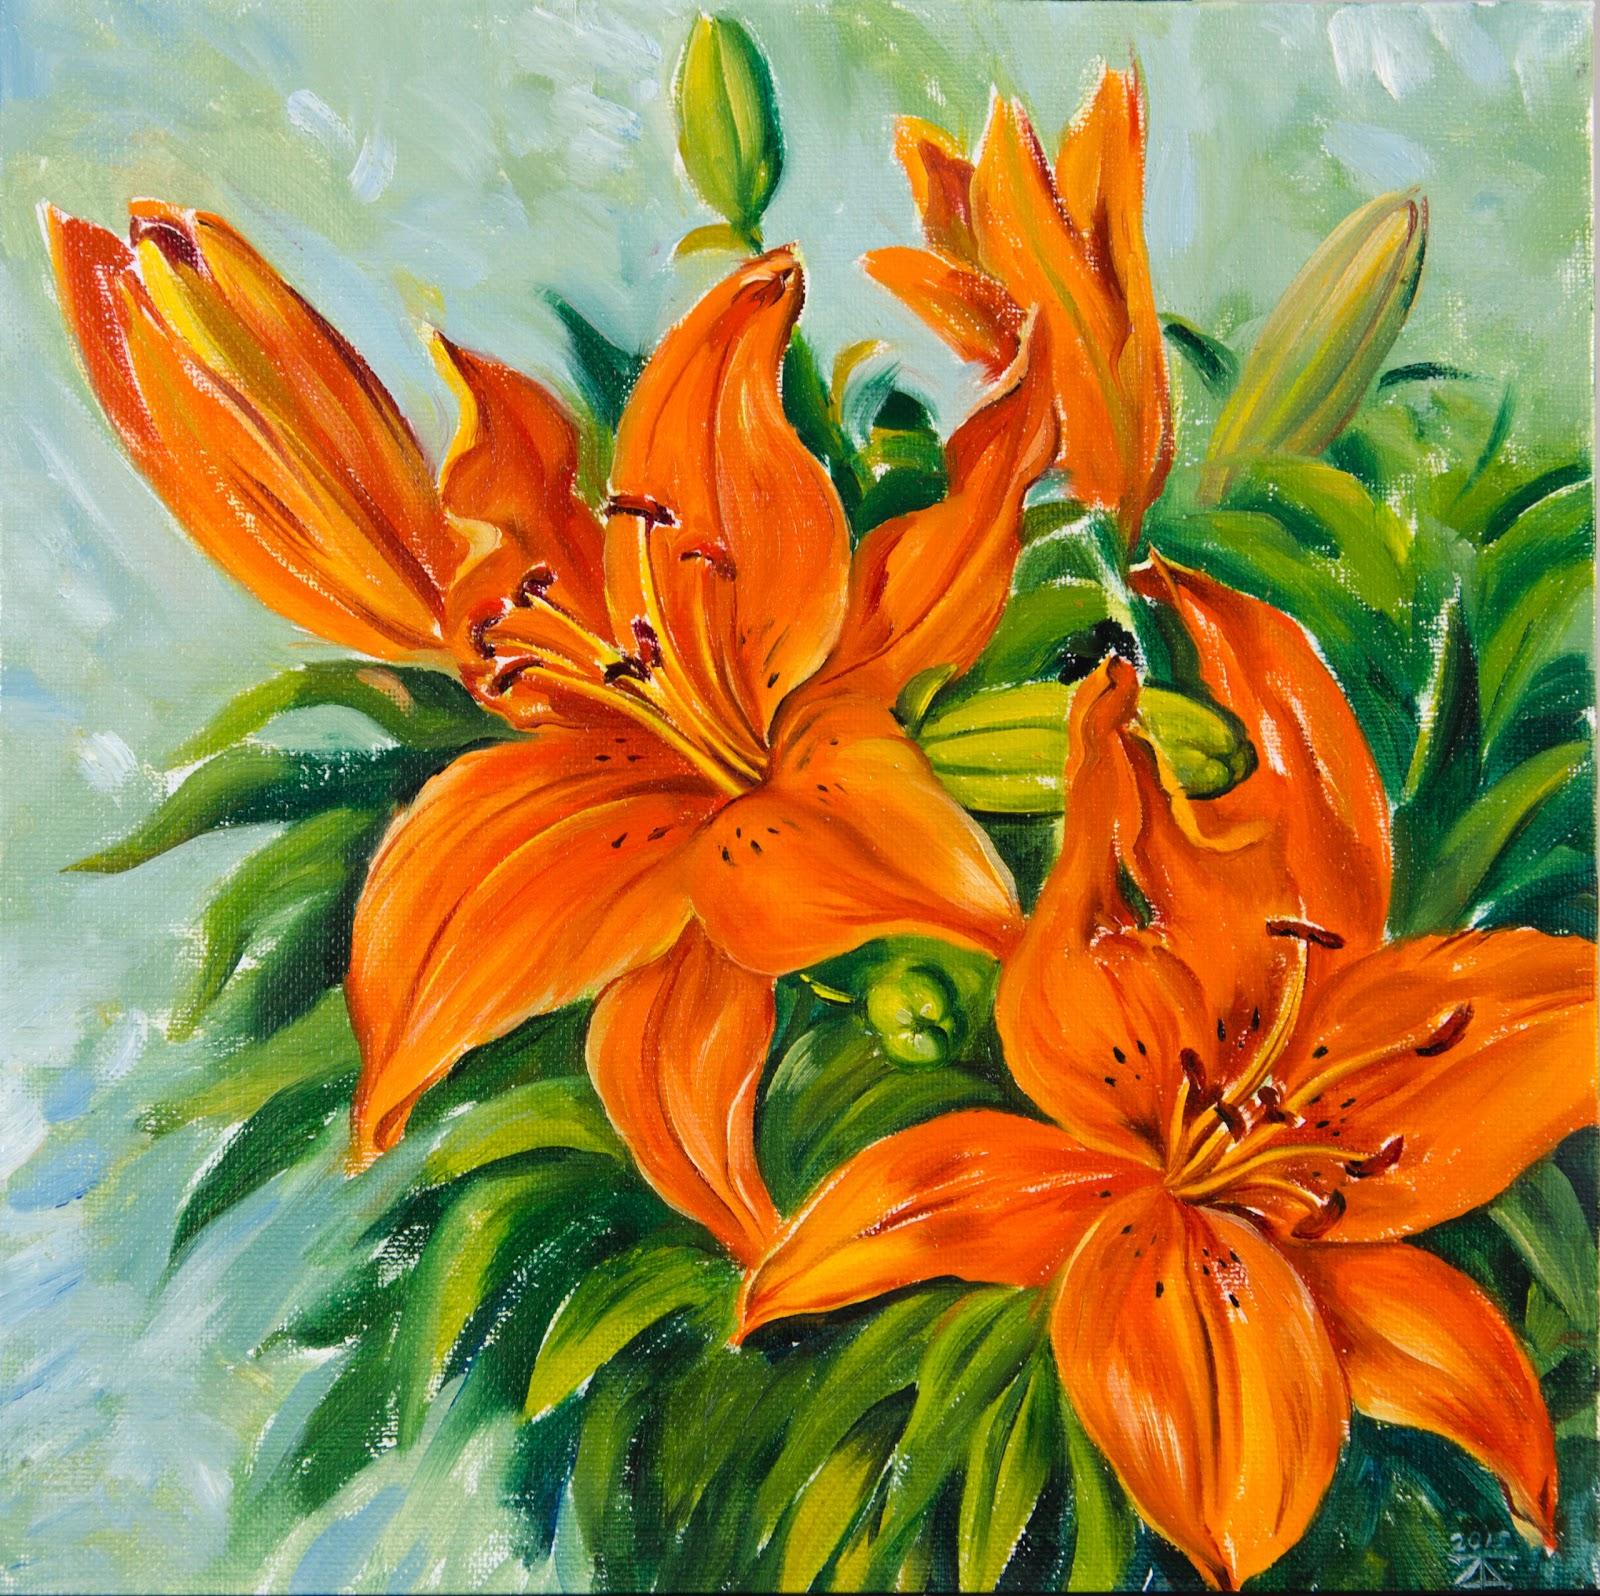 Artwind Original Artworks Oil Painting Orange Lily